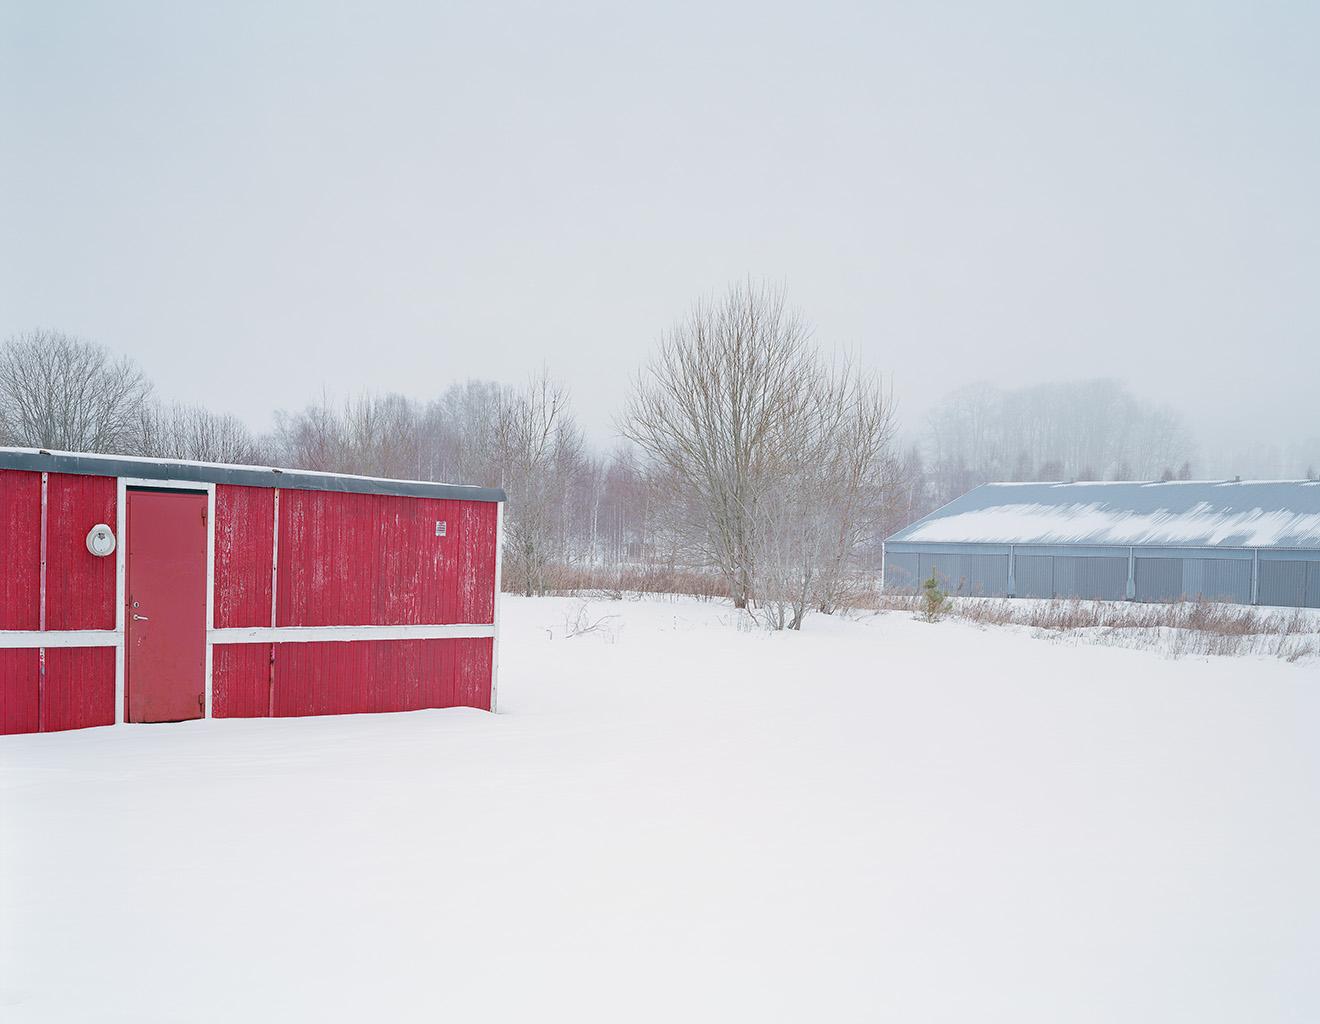 Sawmill area, Hökerum, 13 February 2006